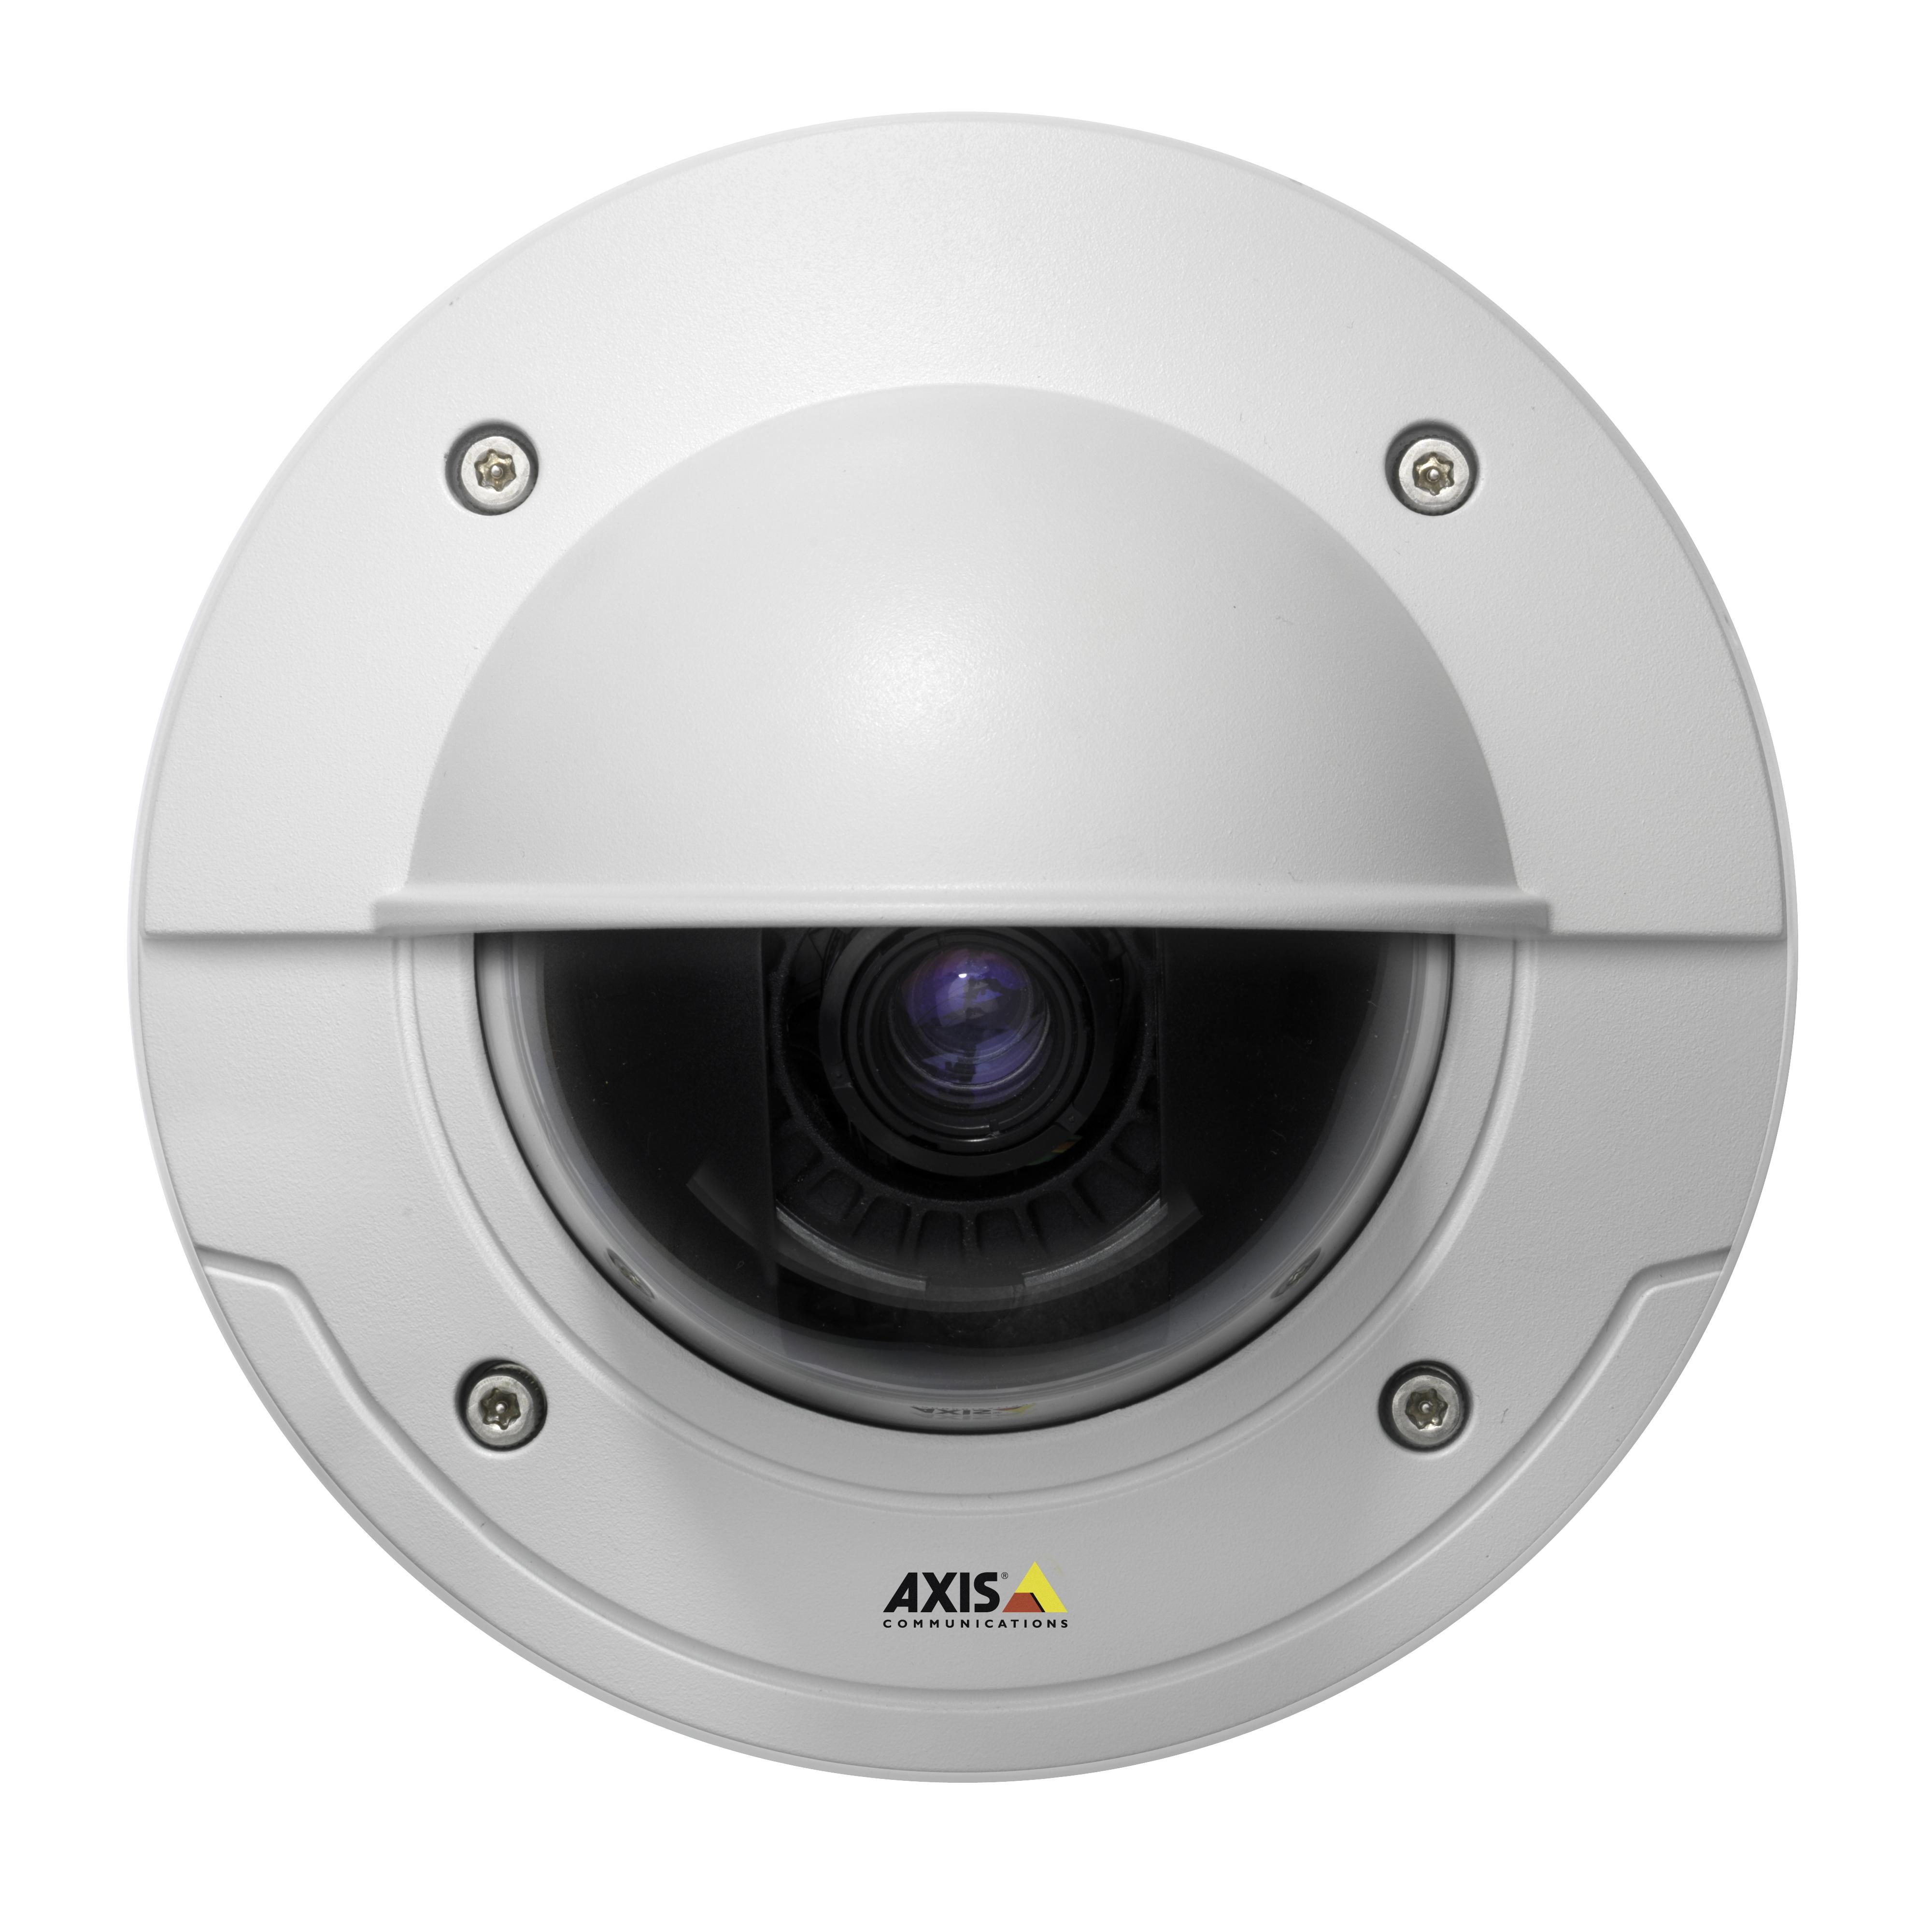 AXIS_P3346-VE_Dome-Netzwerk-Kamera_2